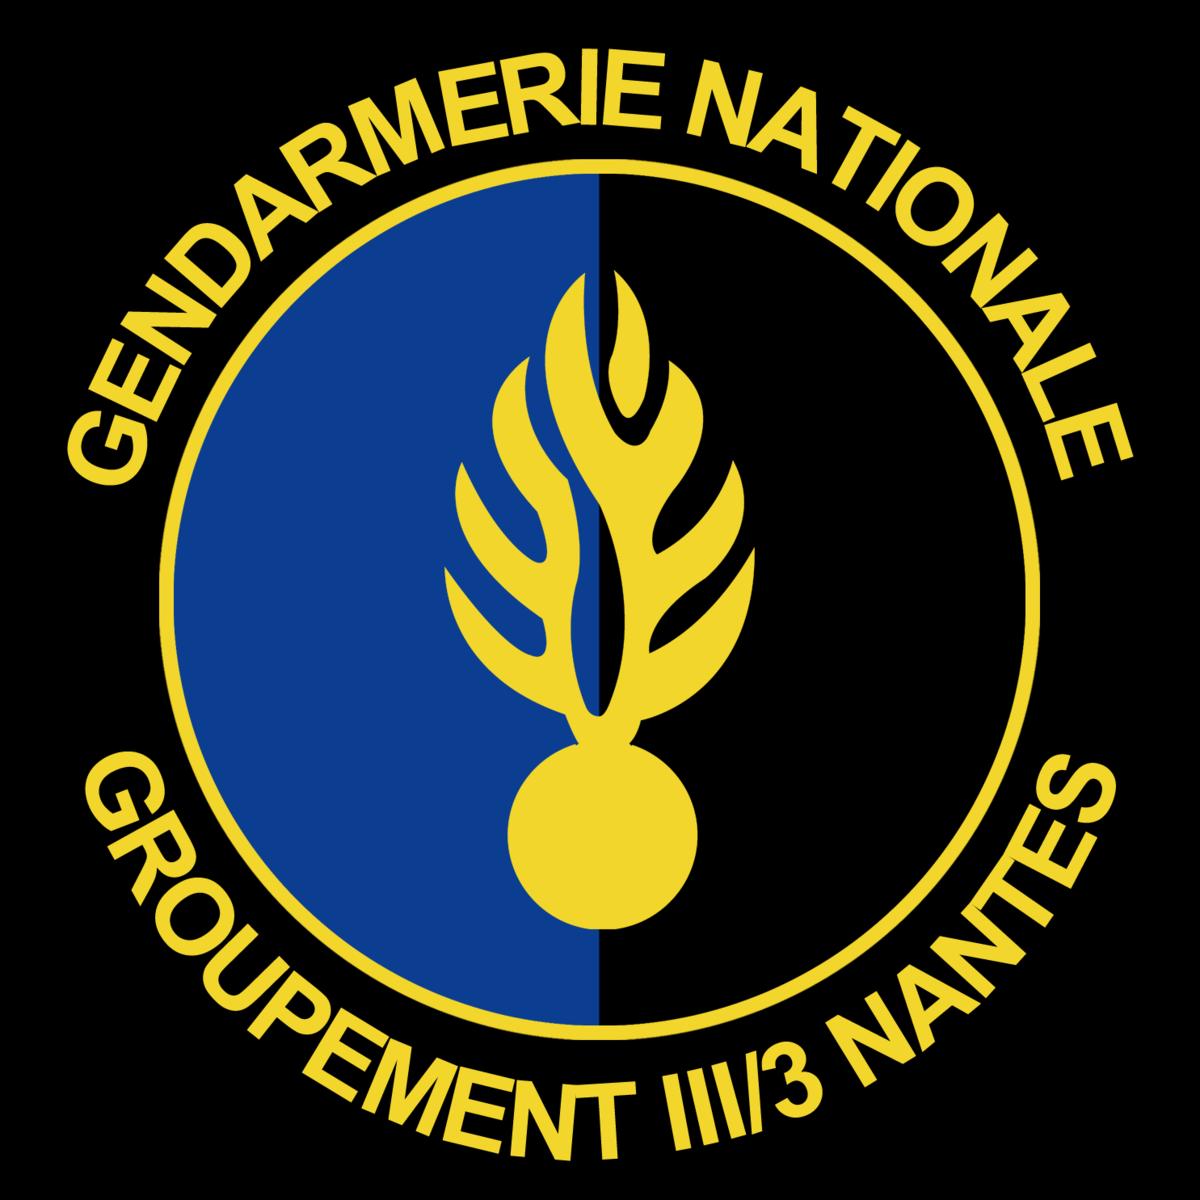 groupement iii 3 de gendarmerie mobile wikip dia. Black Bedroom Furniture Sets. Home Design Ideas